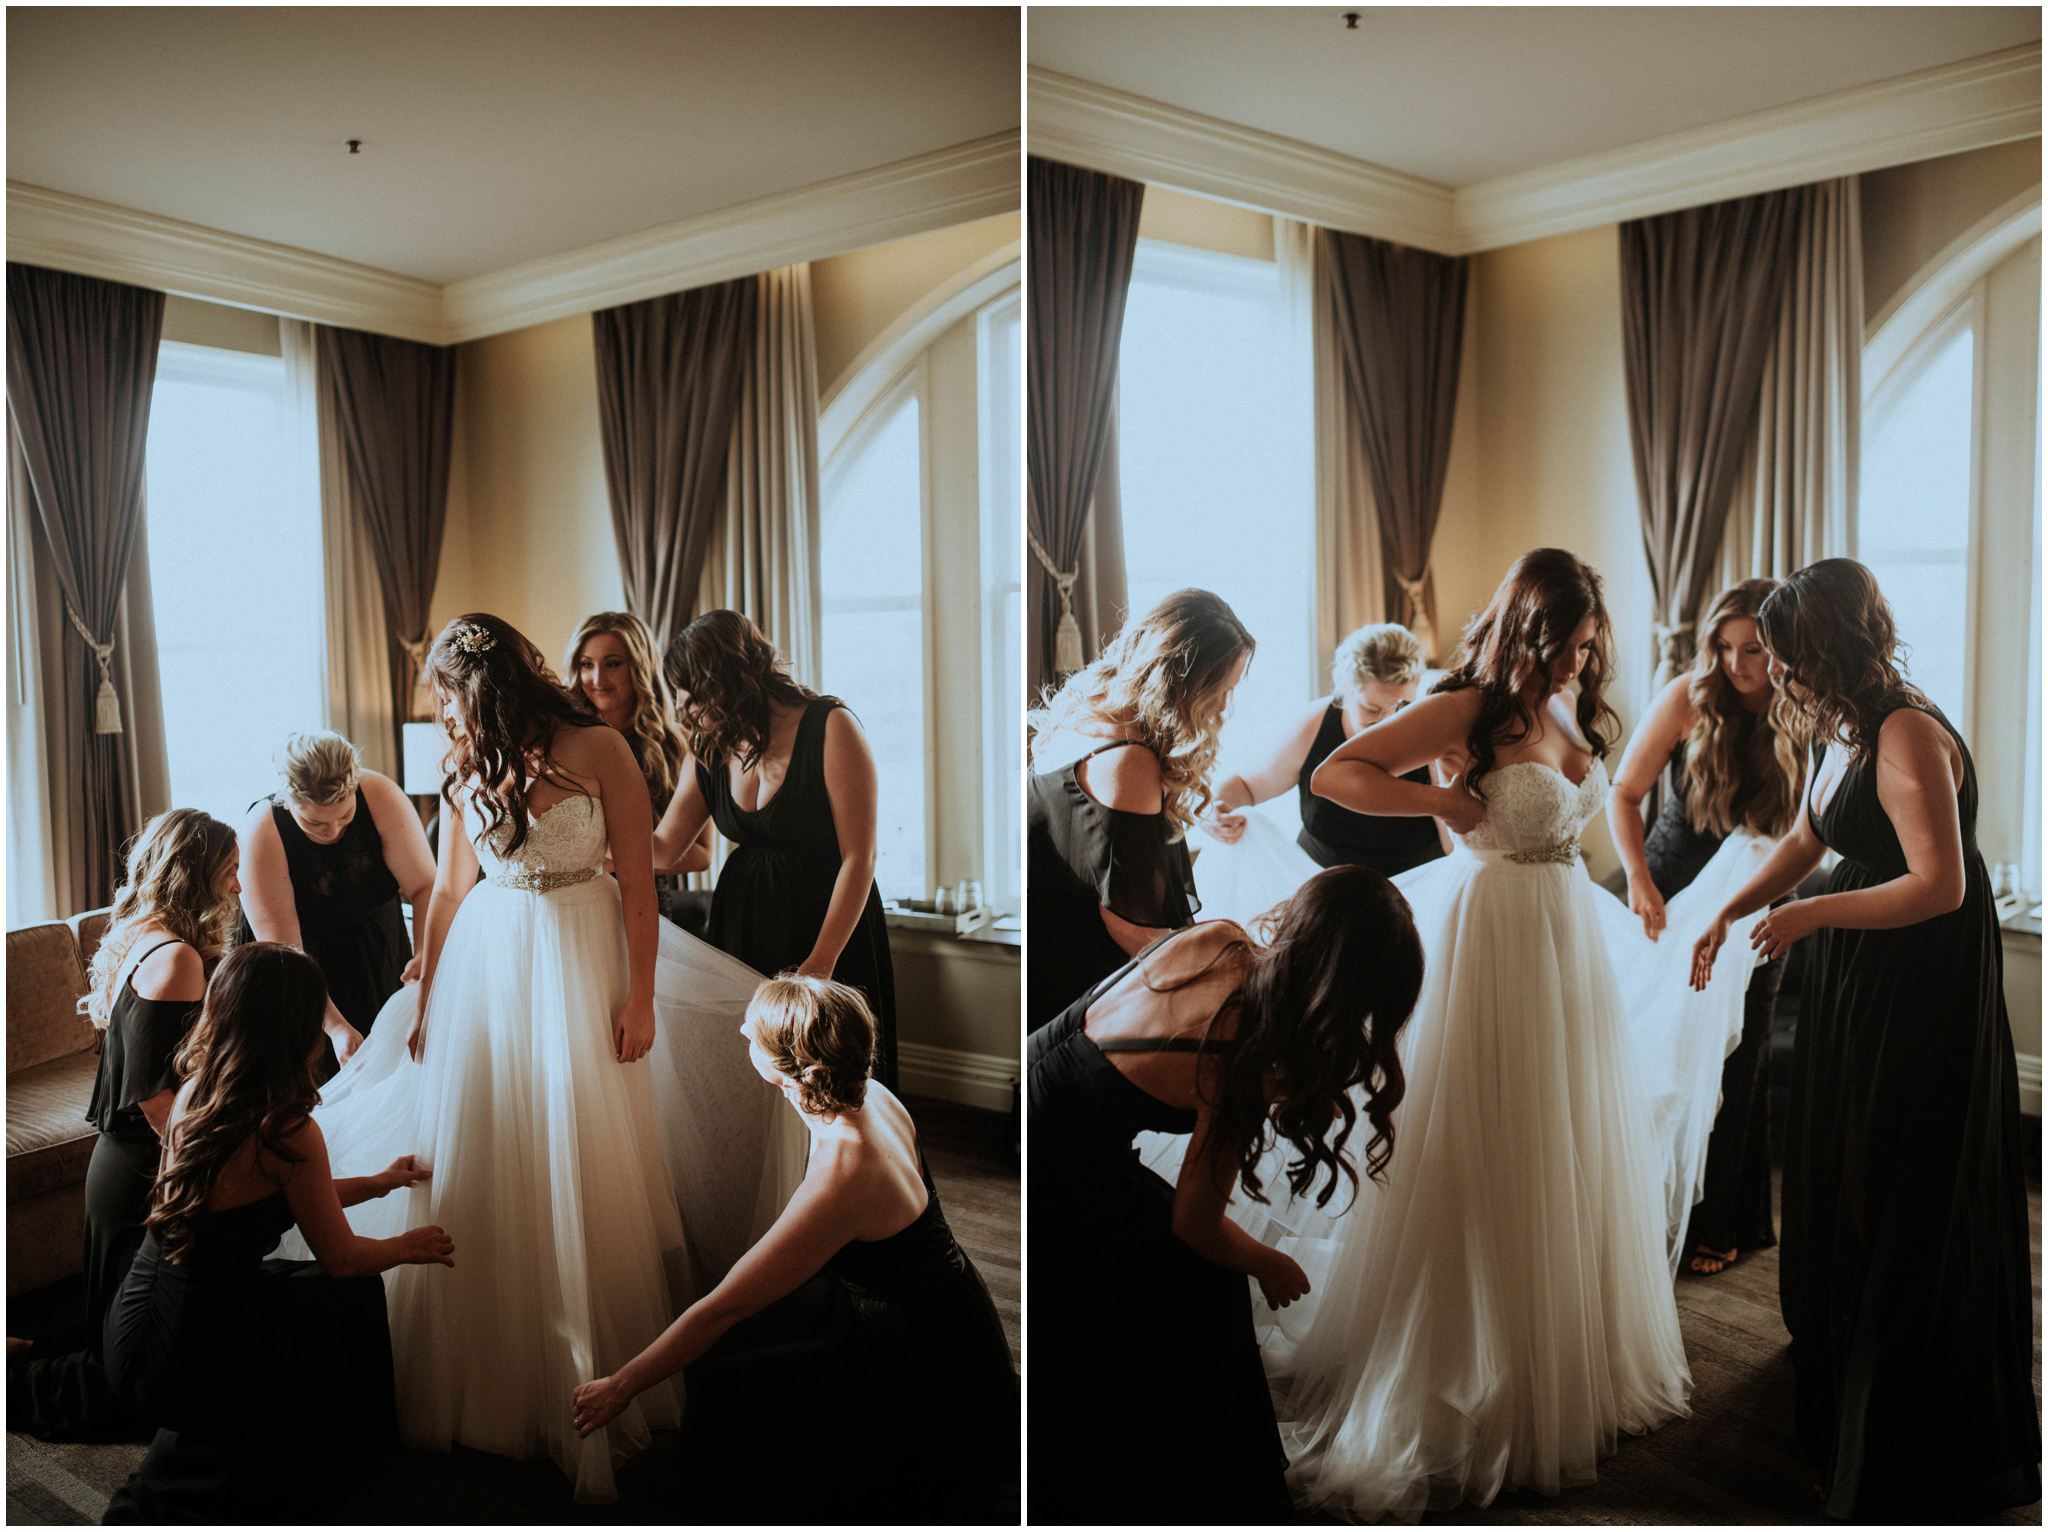 danny+mackenzie+downtown-seattle-axis-wedding-seattle-photographer-017.jpg